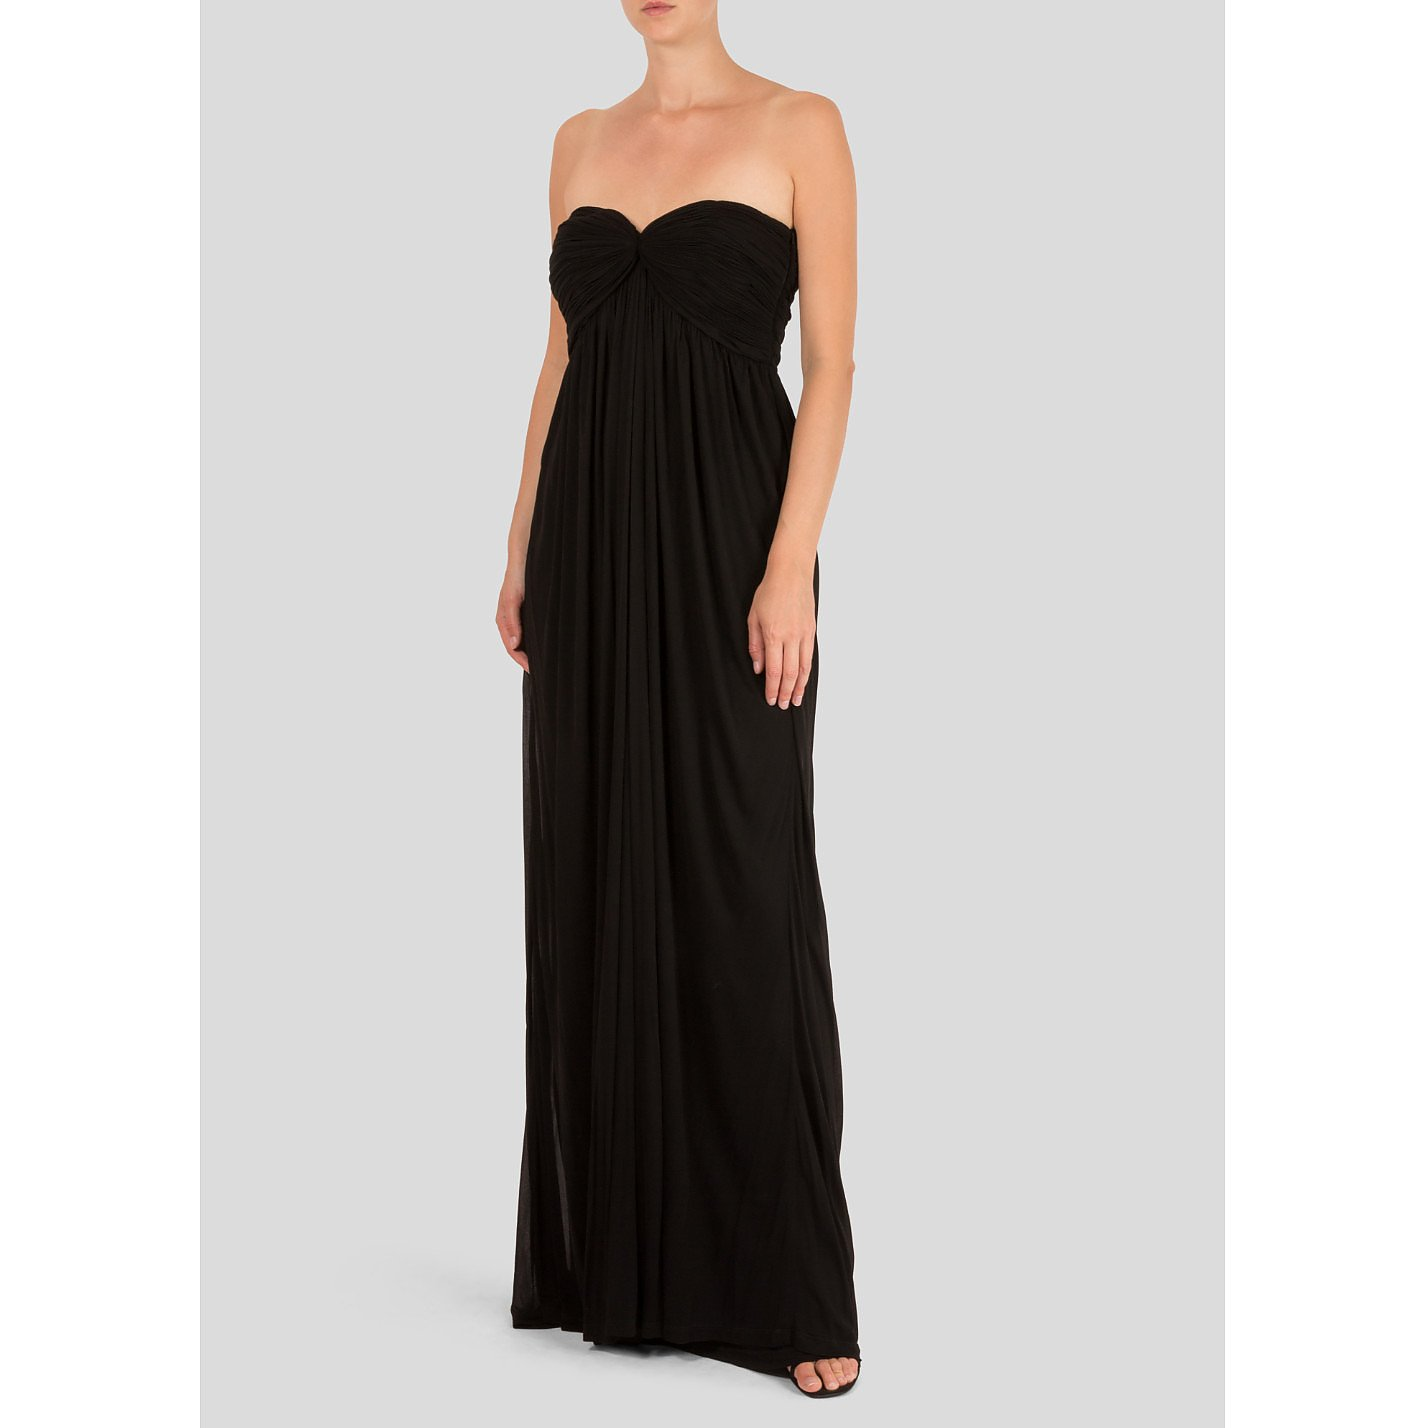 Sophia Kokosalaki Ruched Strapless Gown